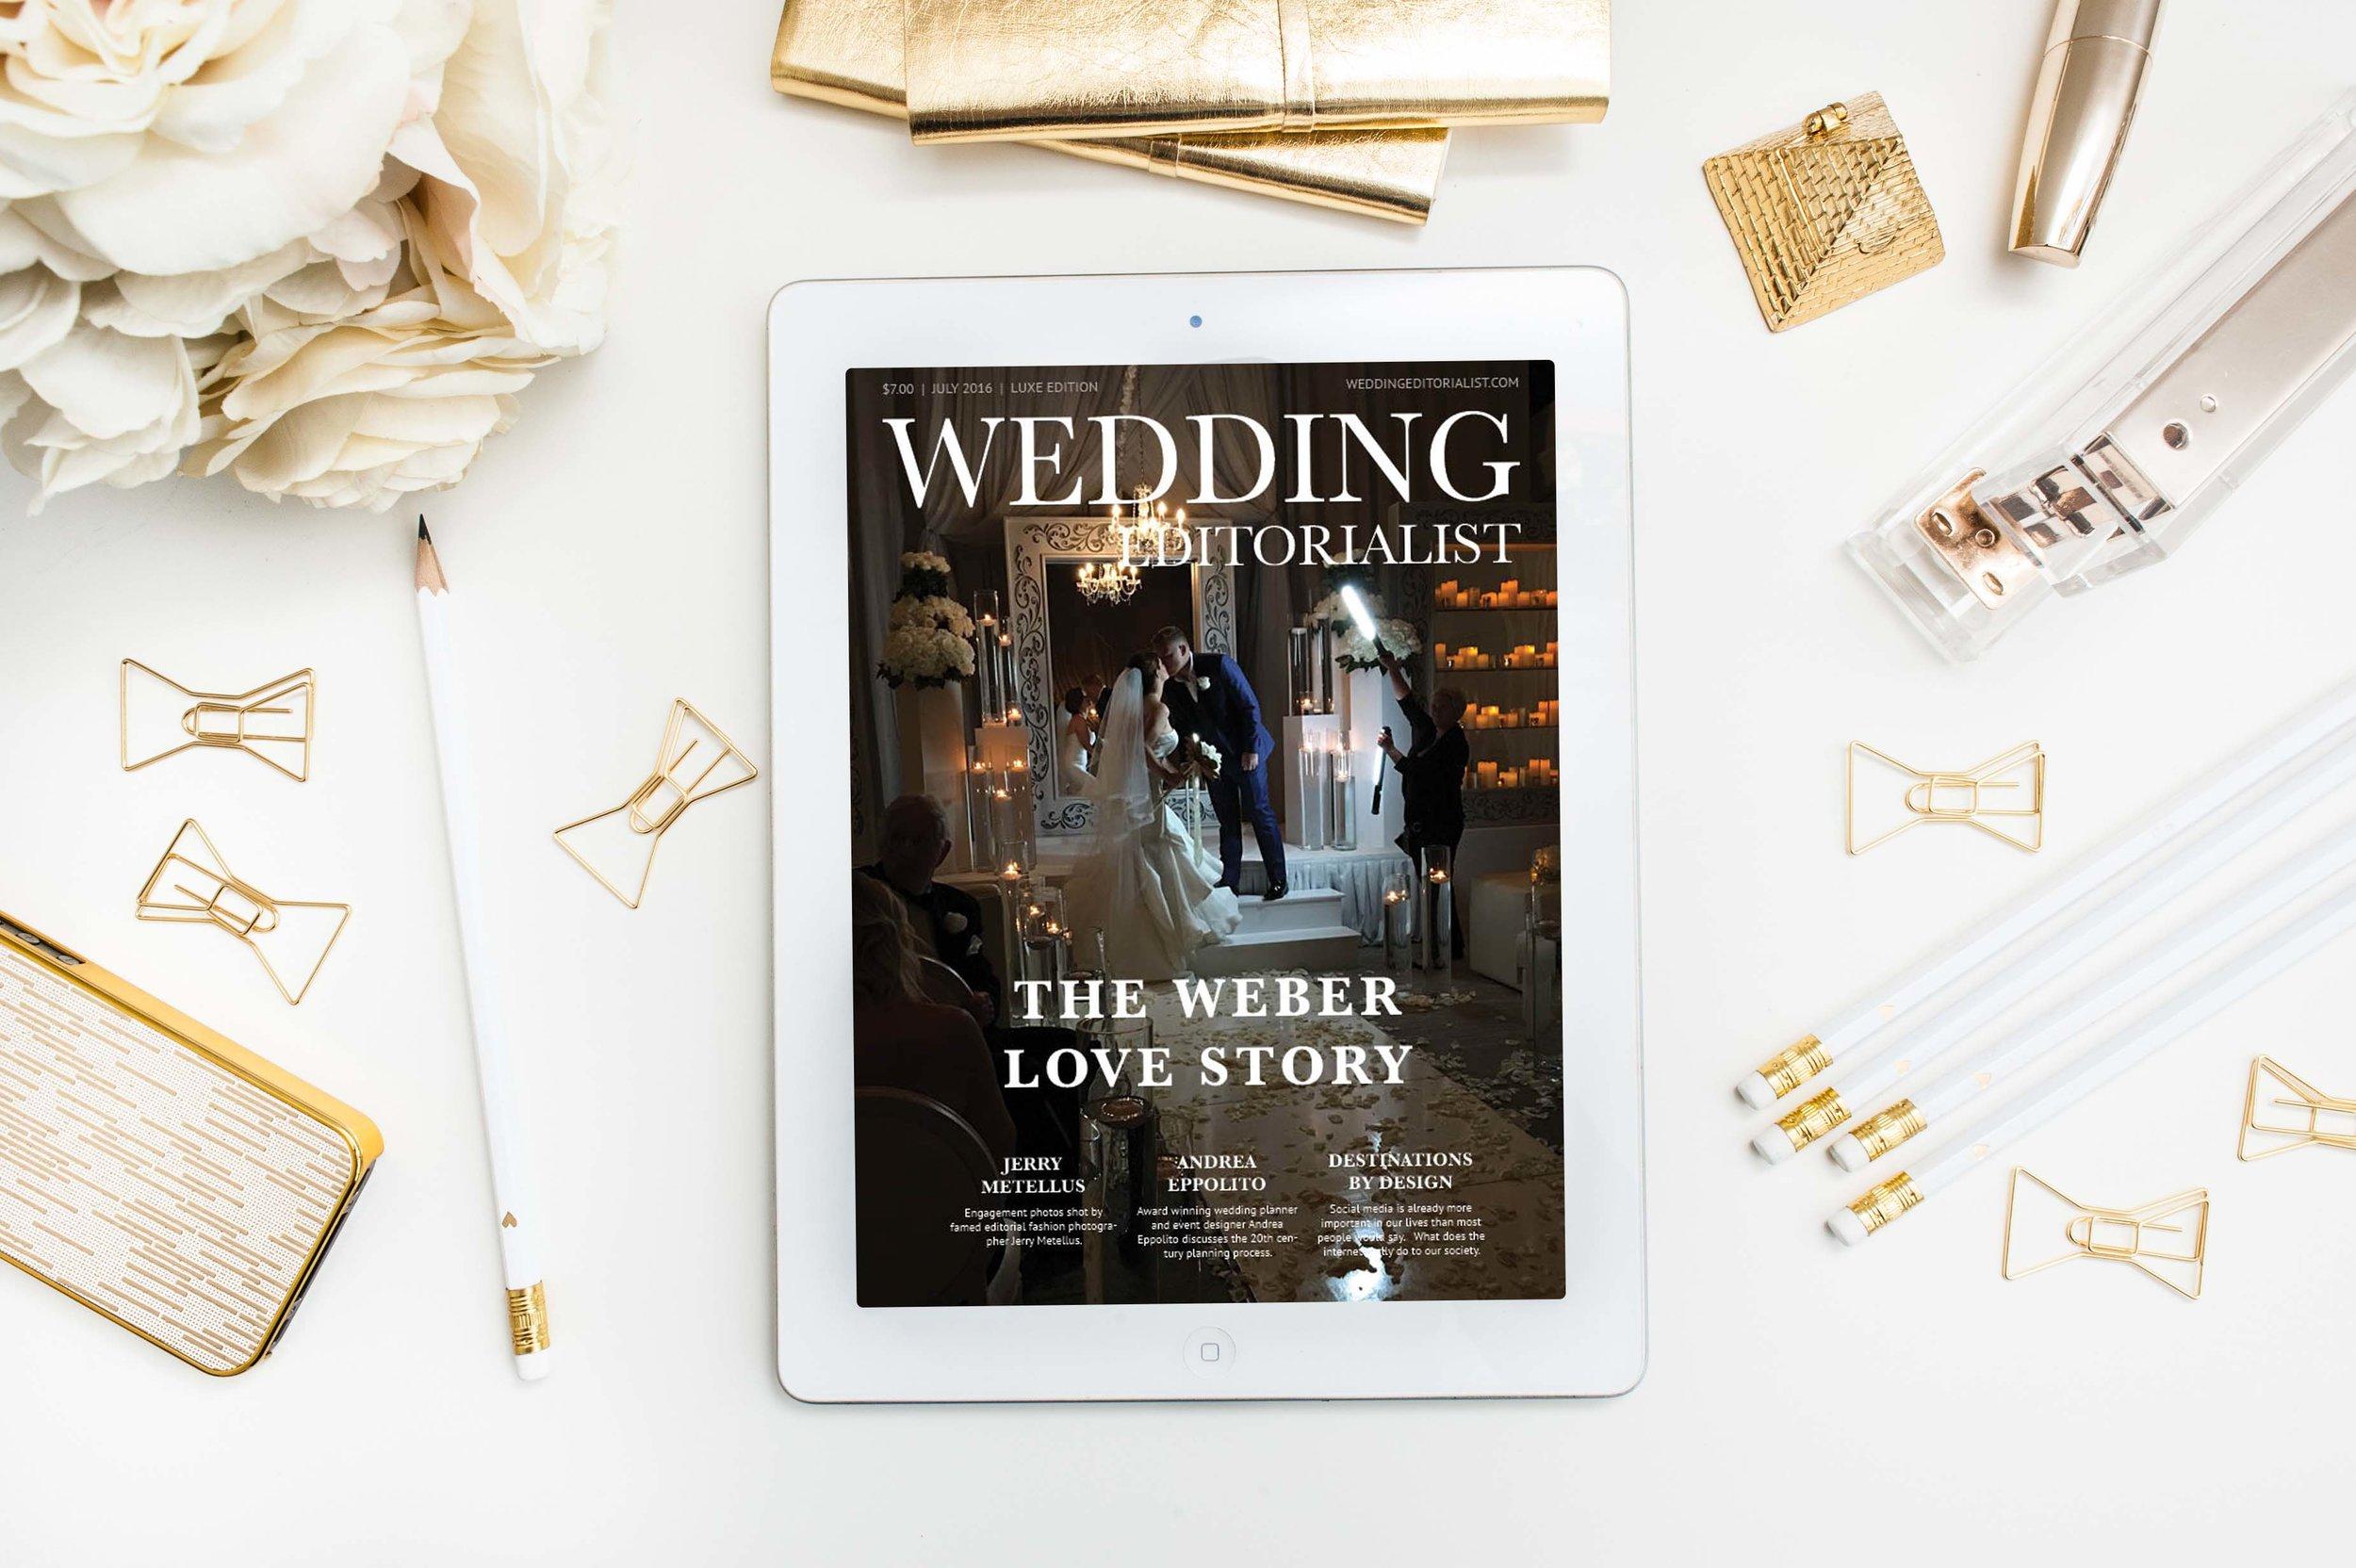 Cover of digital wedding magazine on iPad.